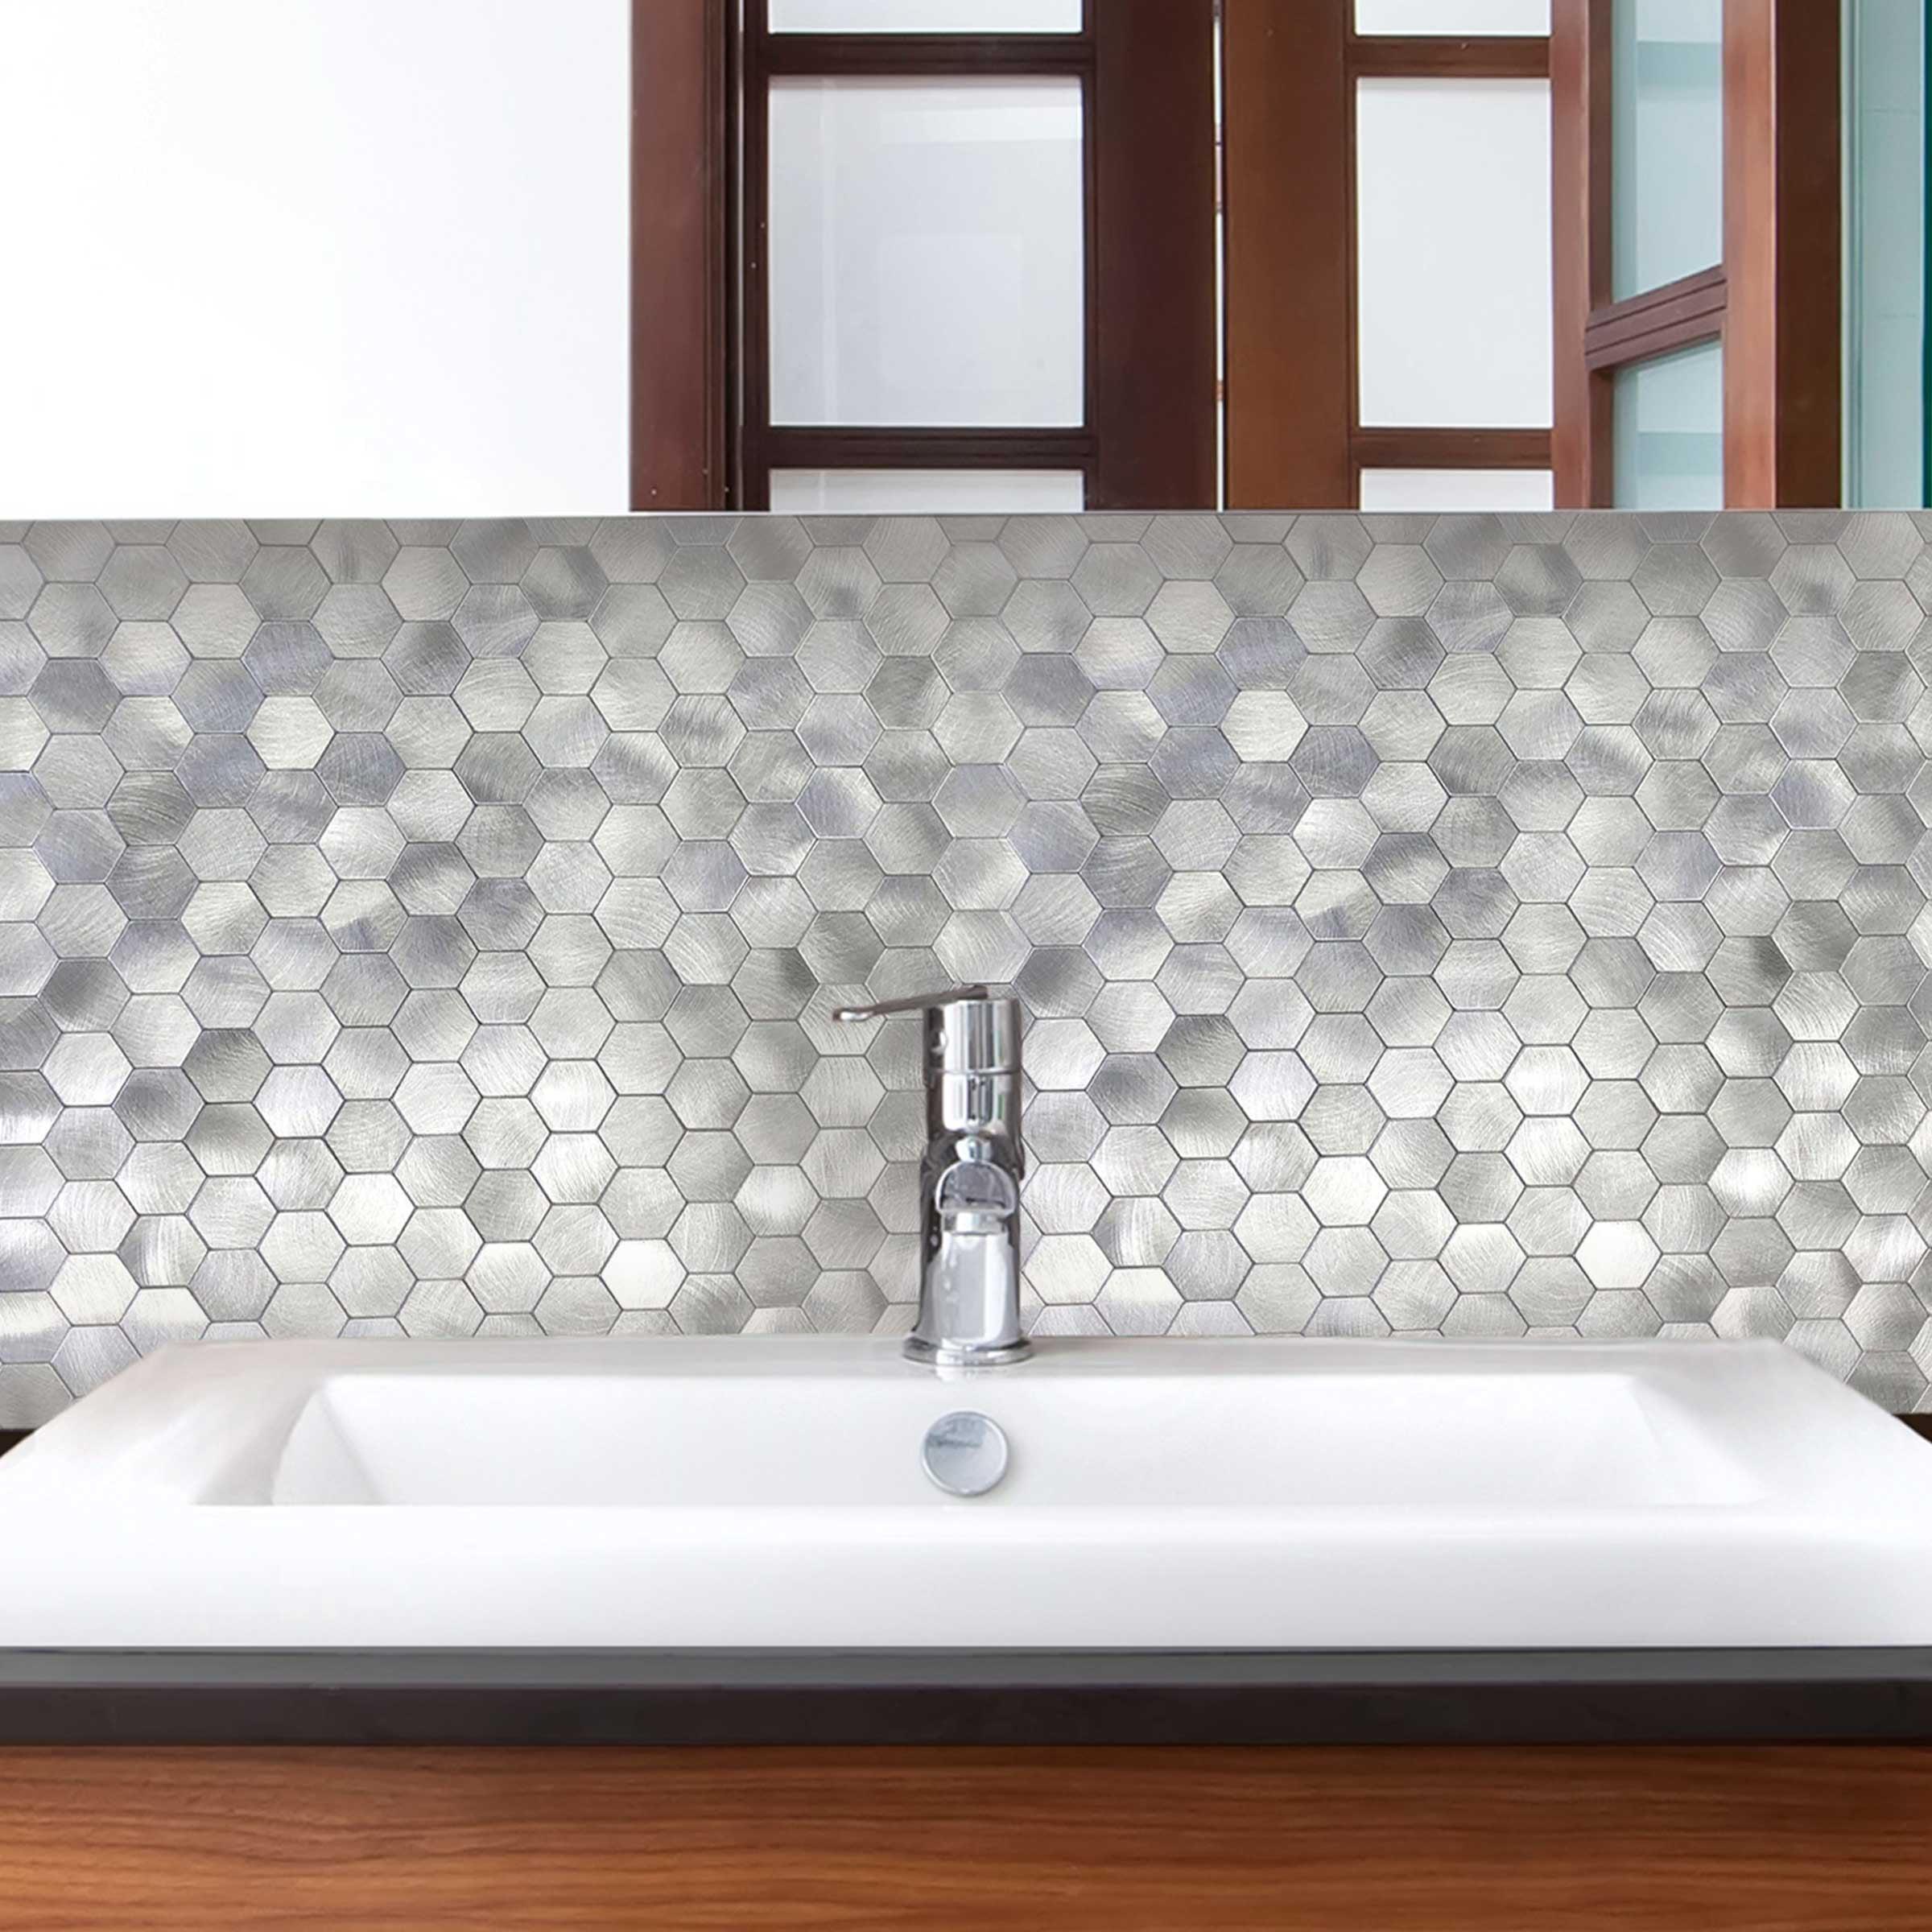 - DIP Mini Silver Subway Tile 10.75 X 13 Self-Adhesive PVC